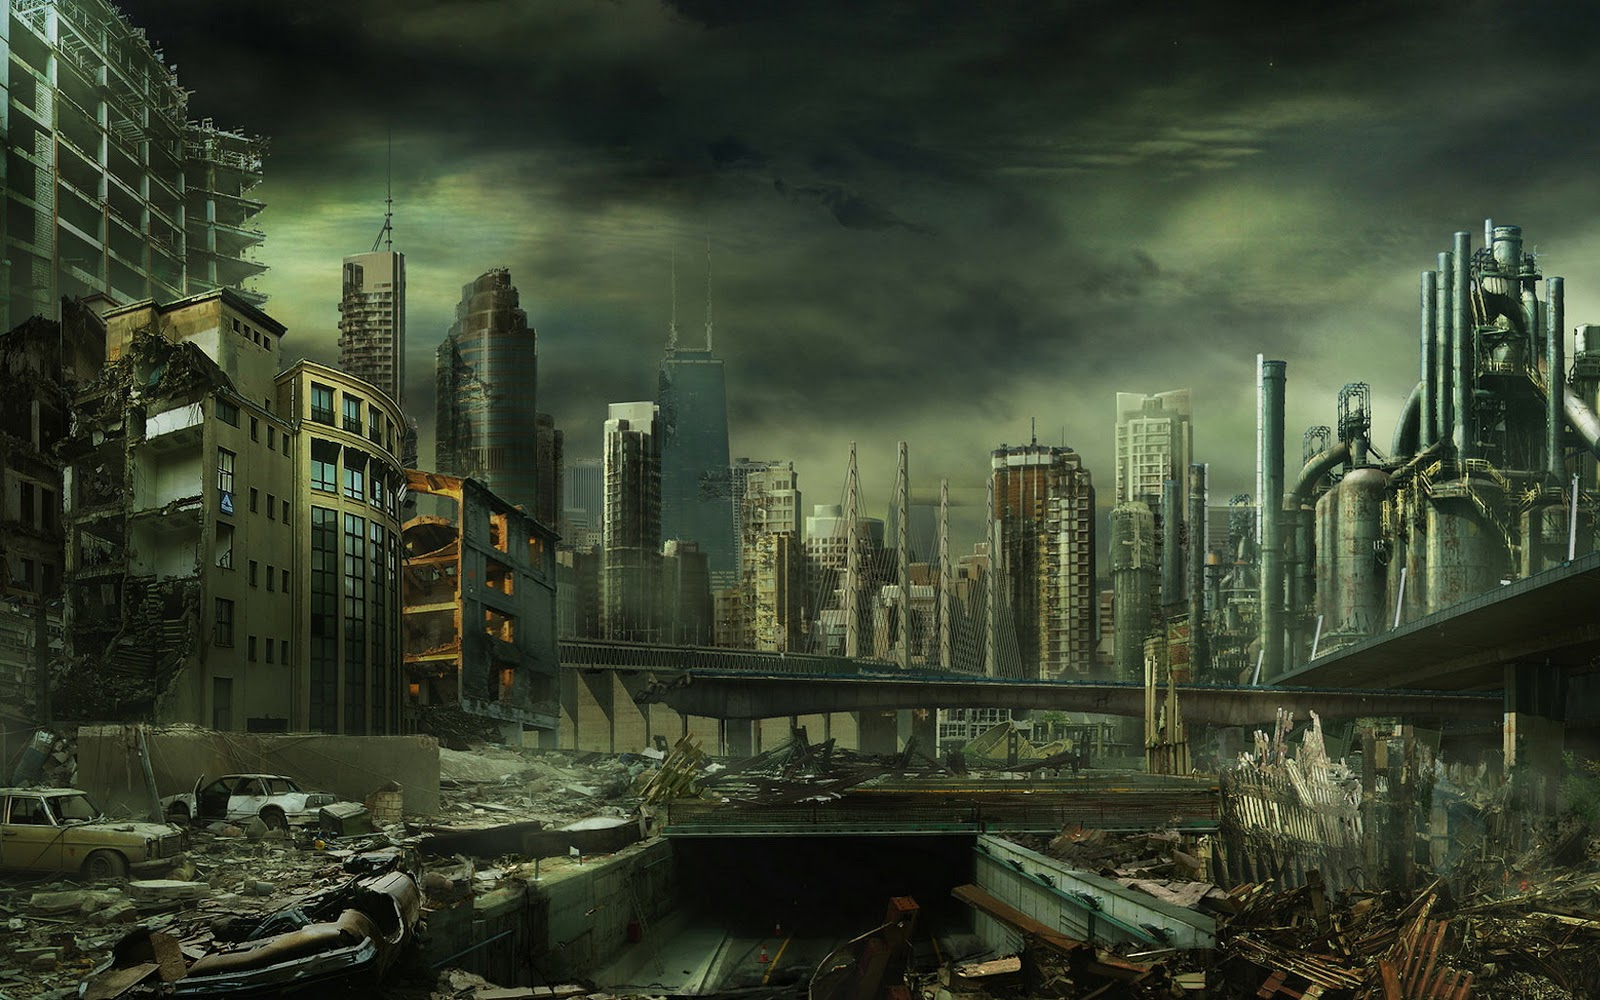 Dark City Wallpapers 1600x1000 pixel City HD Wallpaper 39421 1600x1000